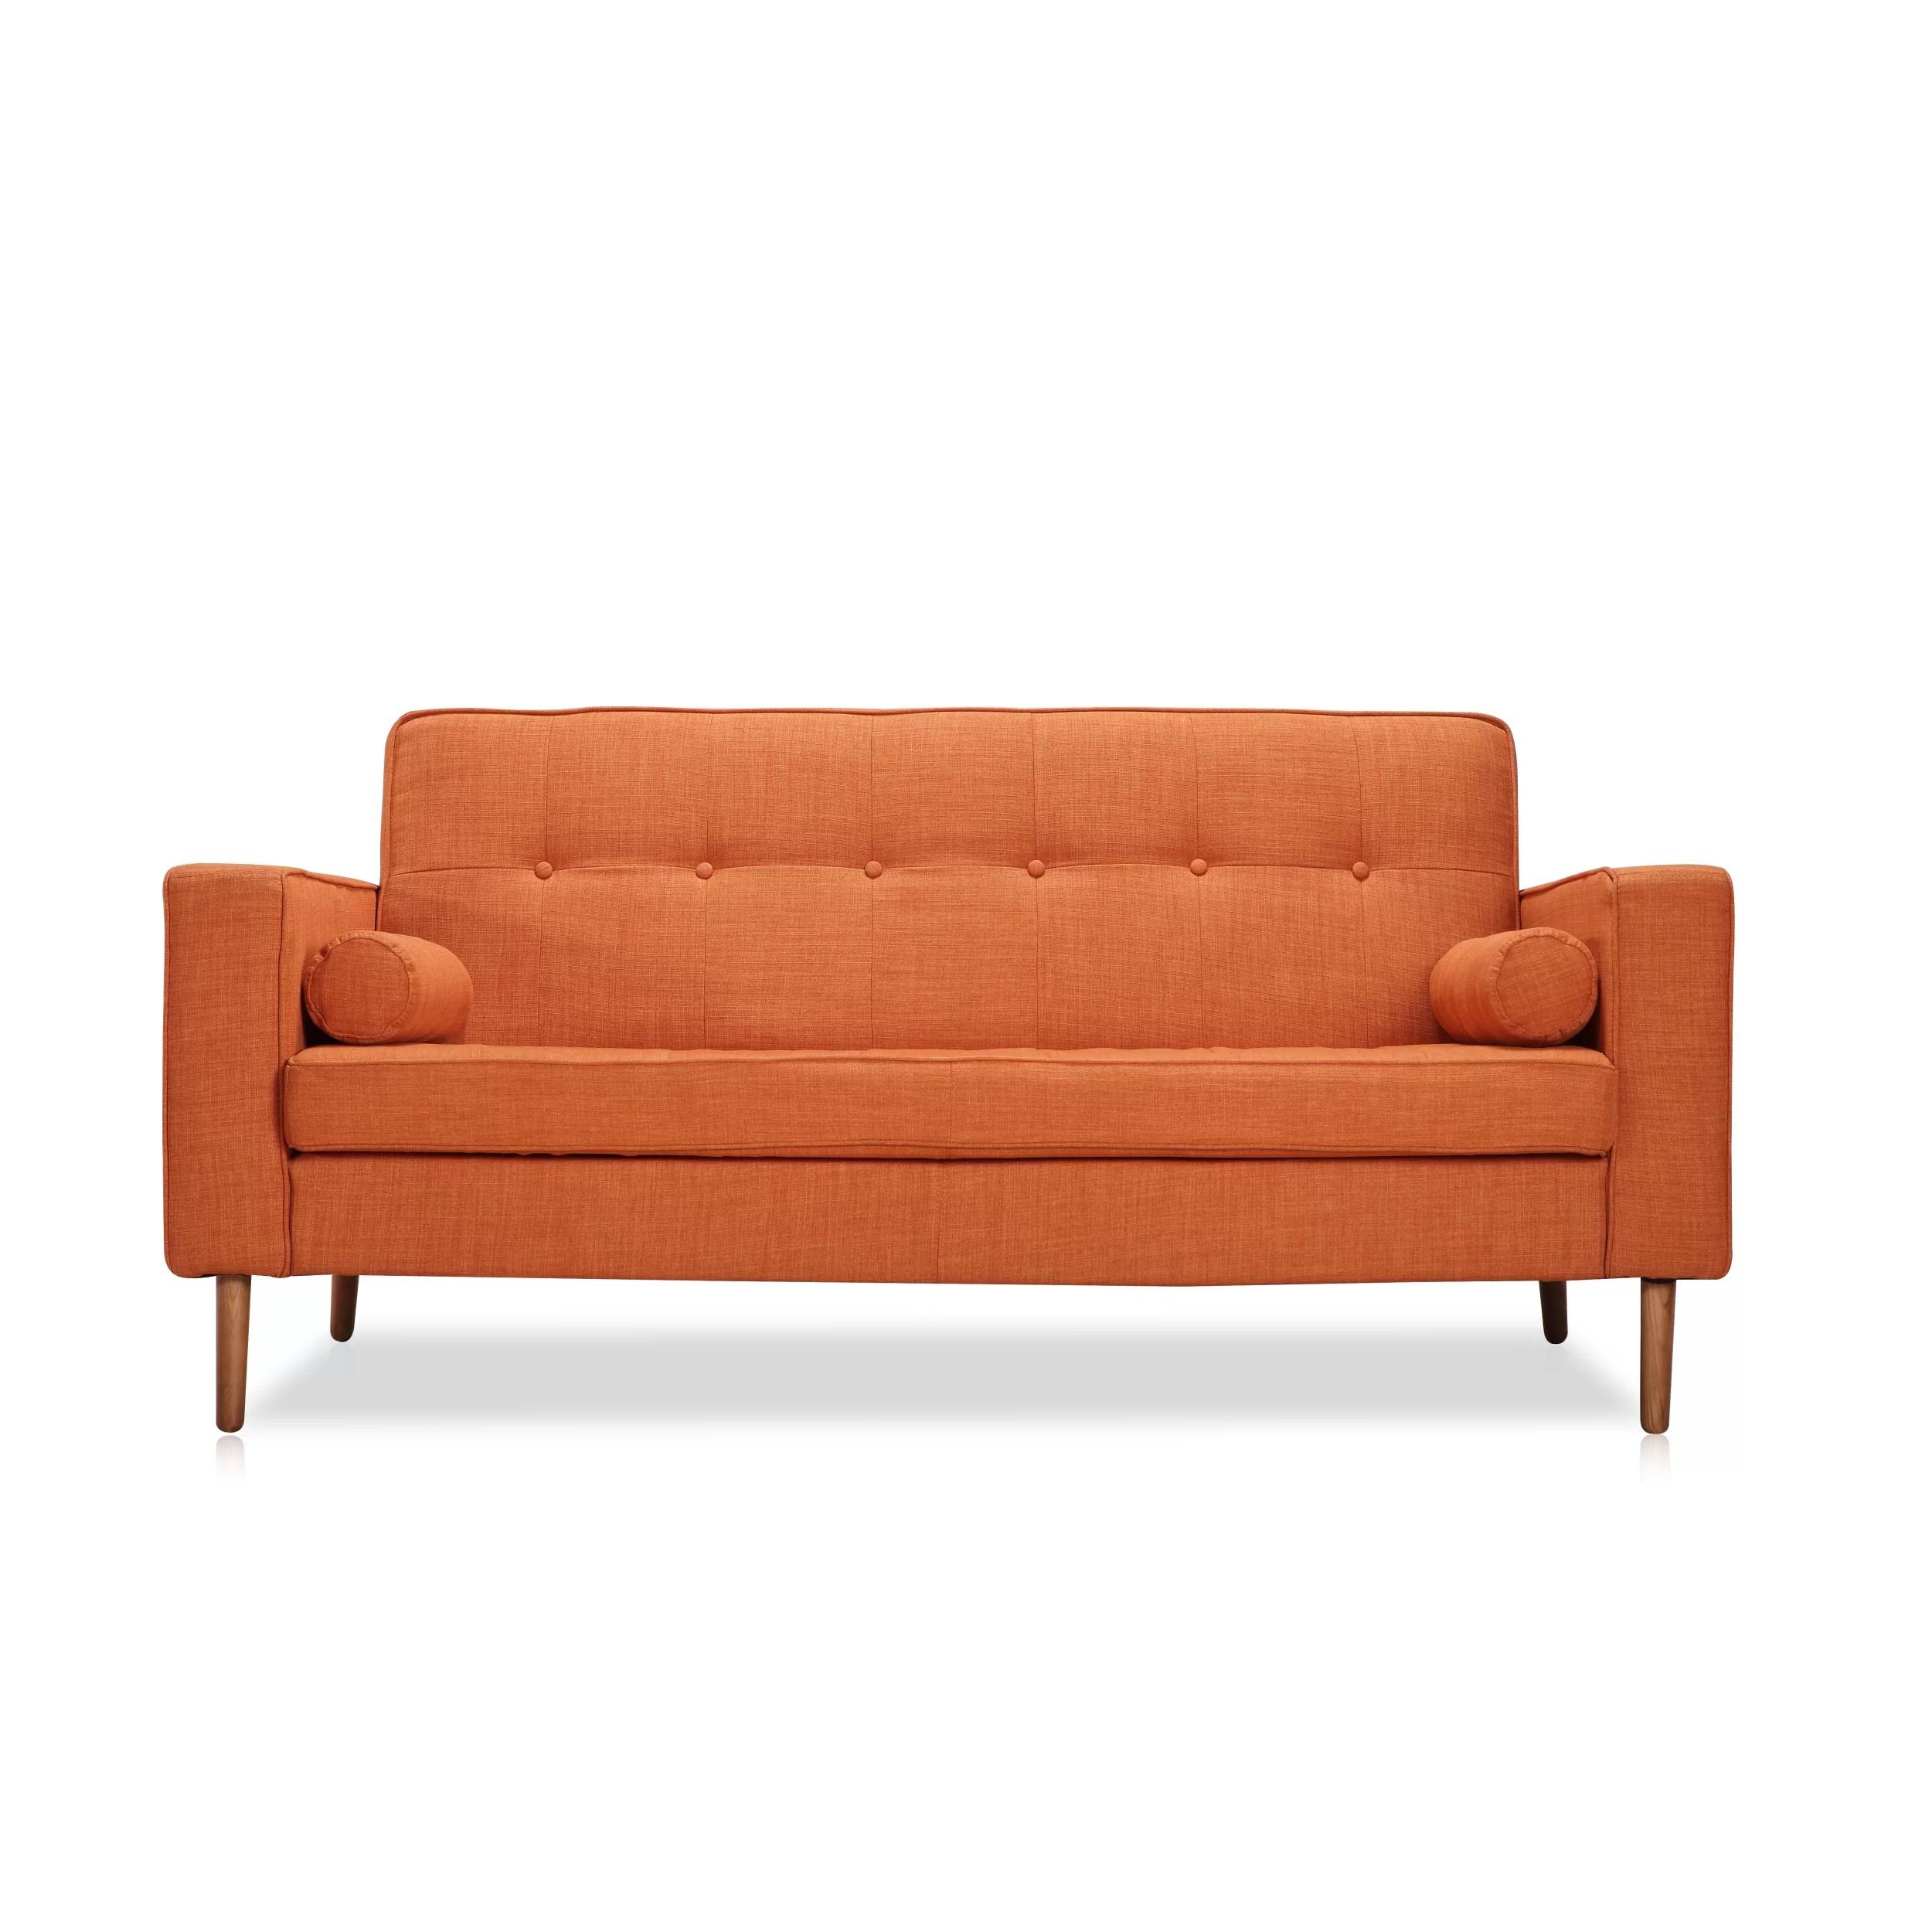 baxter sofa smart covers ceets and reviews wayfair